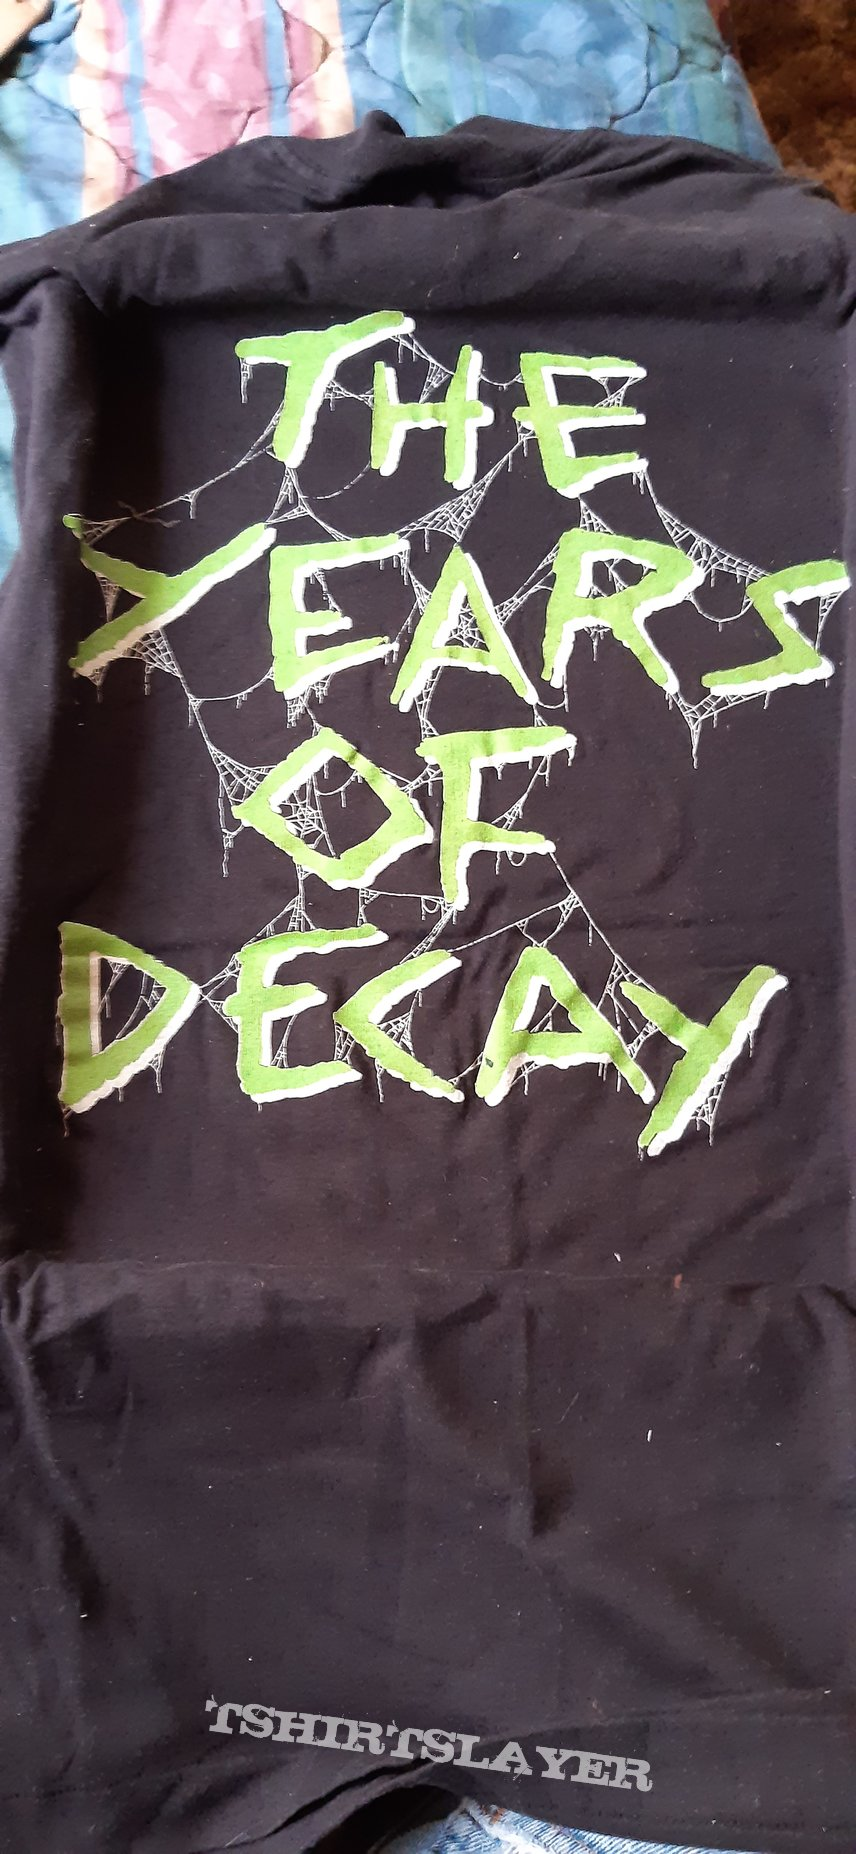 Overkill Bobby Gustafson's Skullkrusher Years of Decay tour shirt